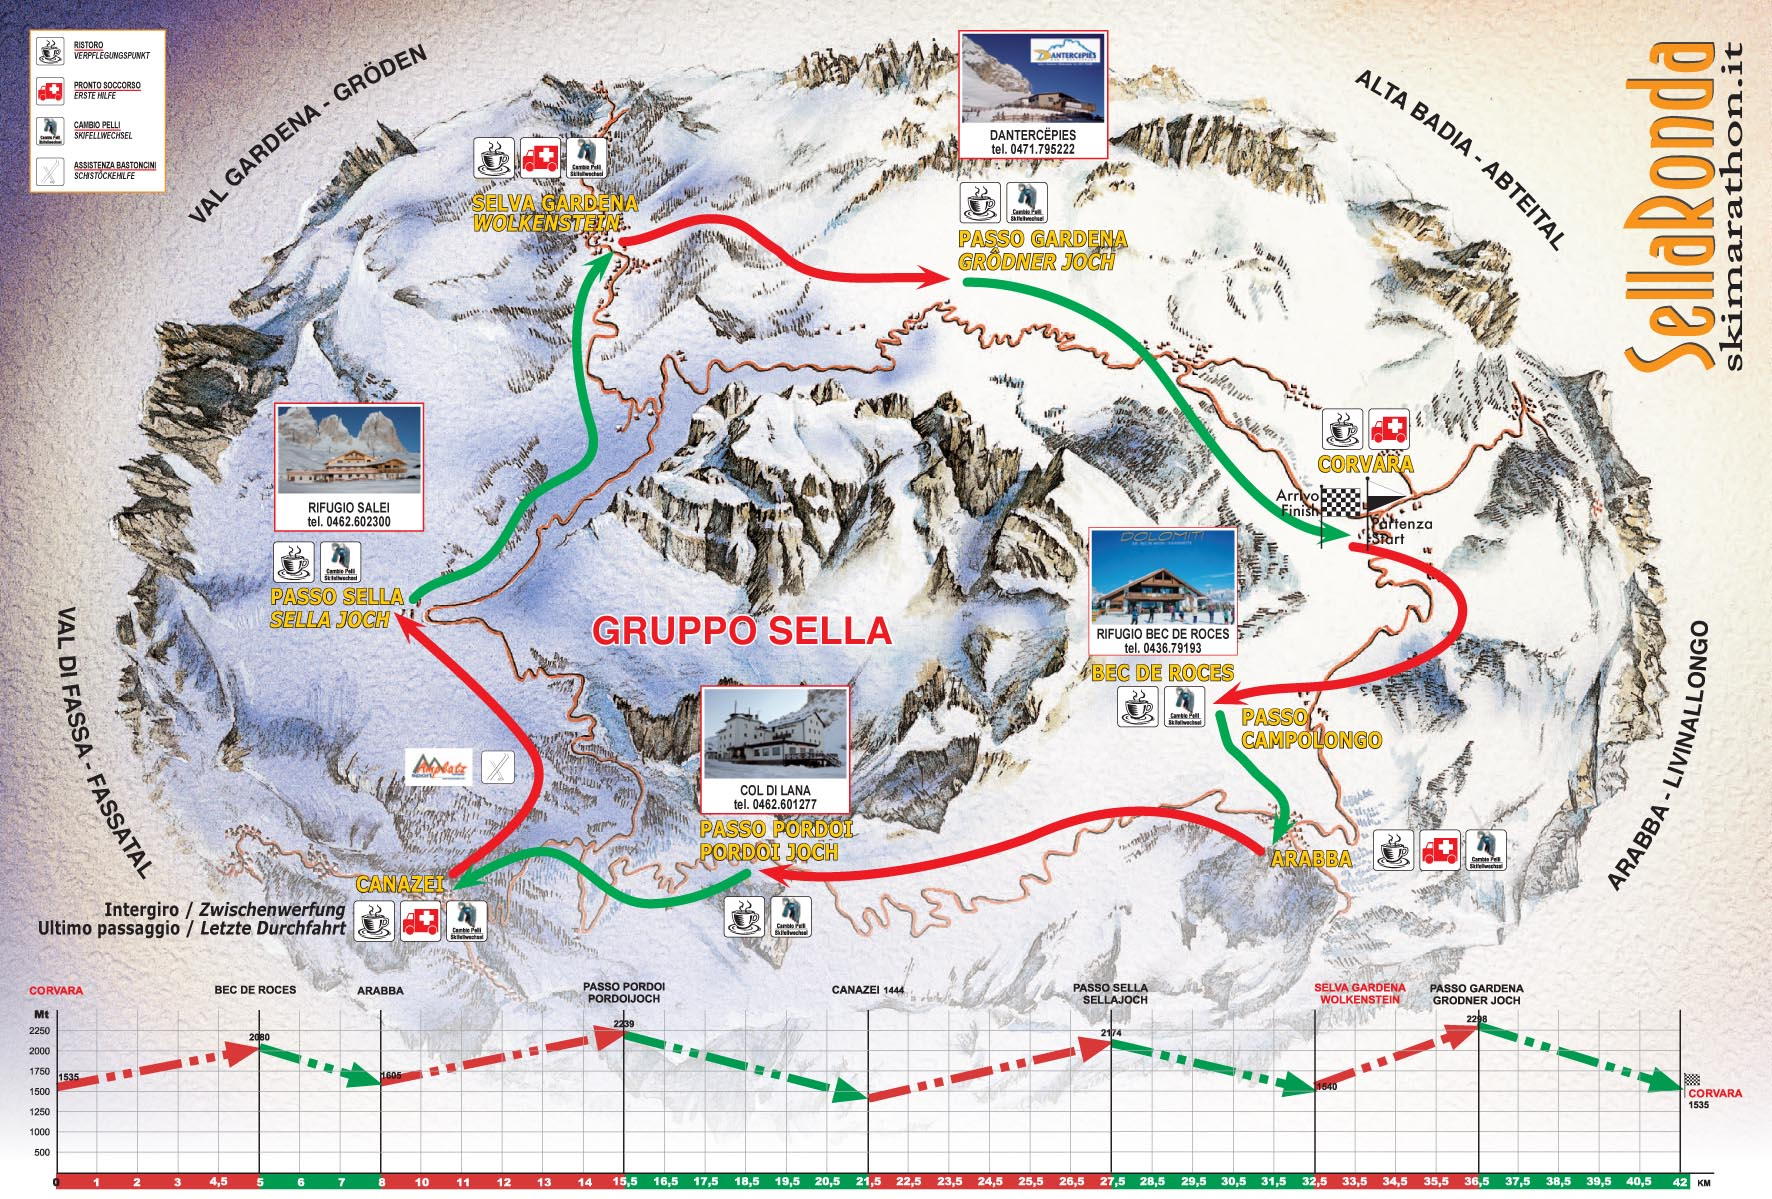 Die Strecke: SELLARONDA 2013 – Skitourenmarathon